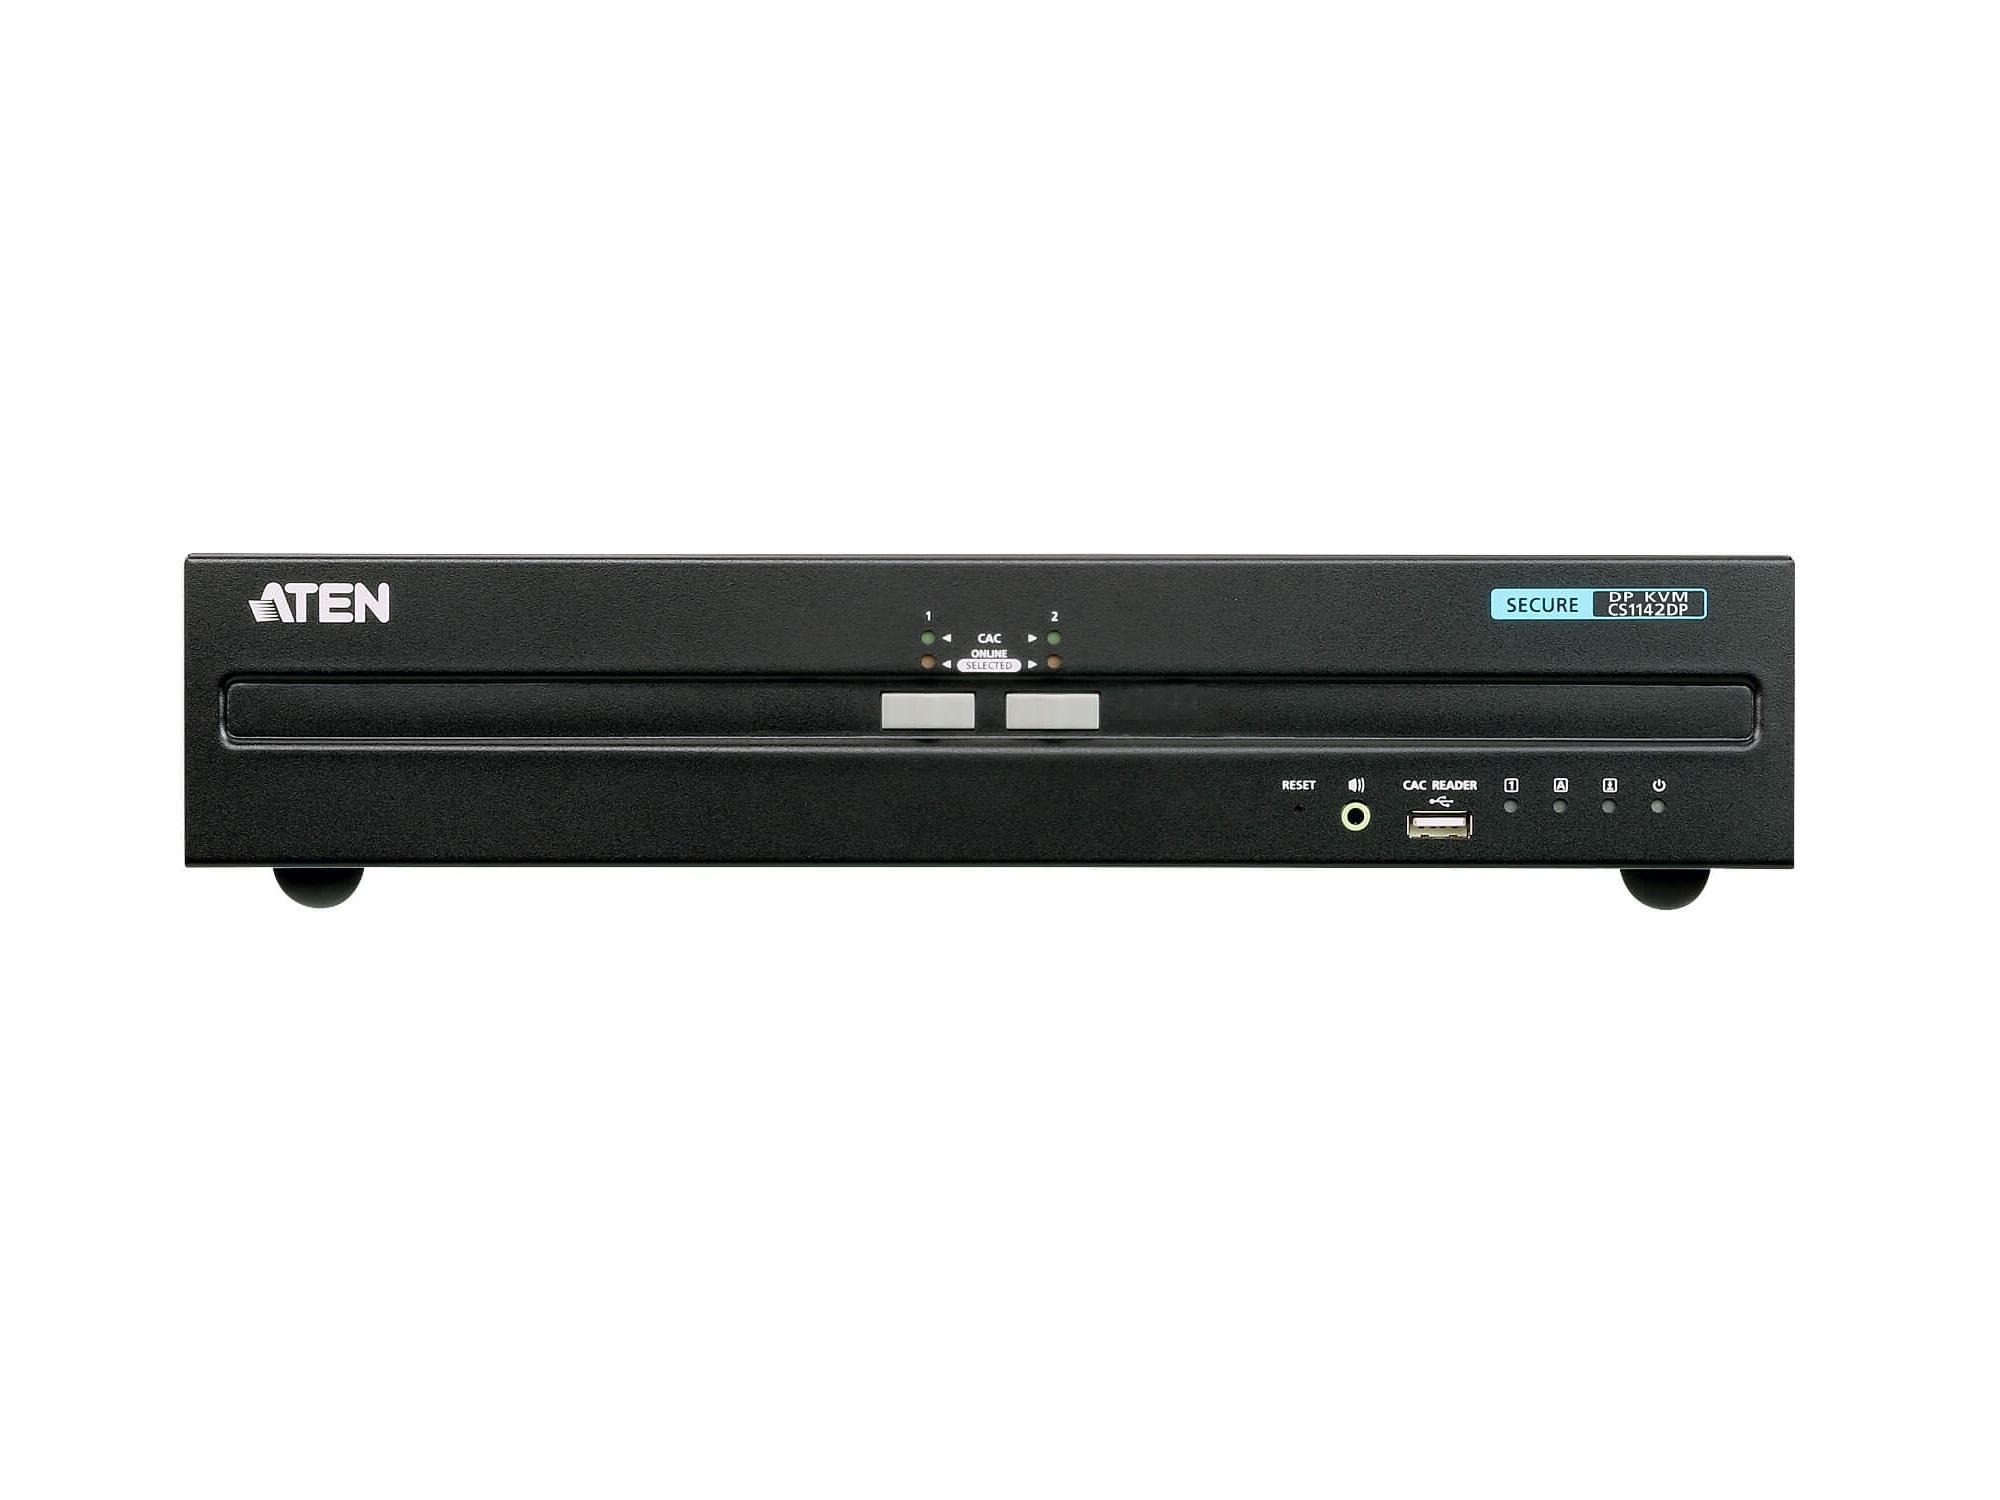 Aten CS1142DP 2-Port USB DisplayPort Dual Display Secure KVM Switch (PSS PP v3.0 Compliant)